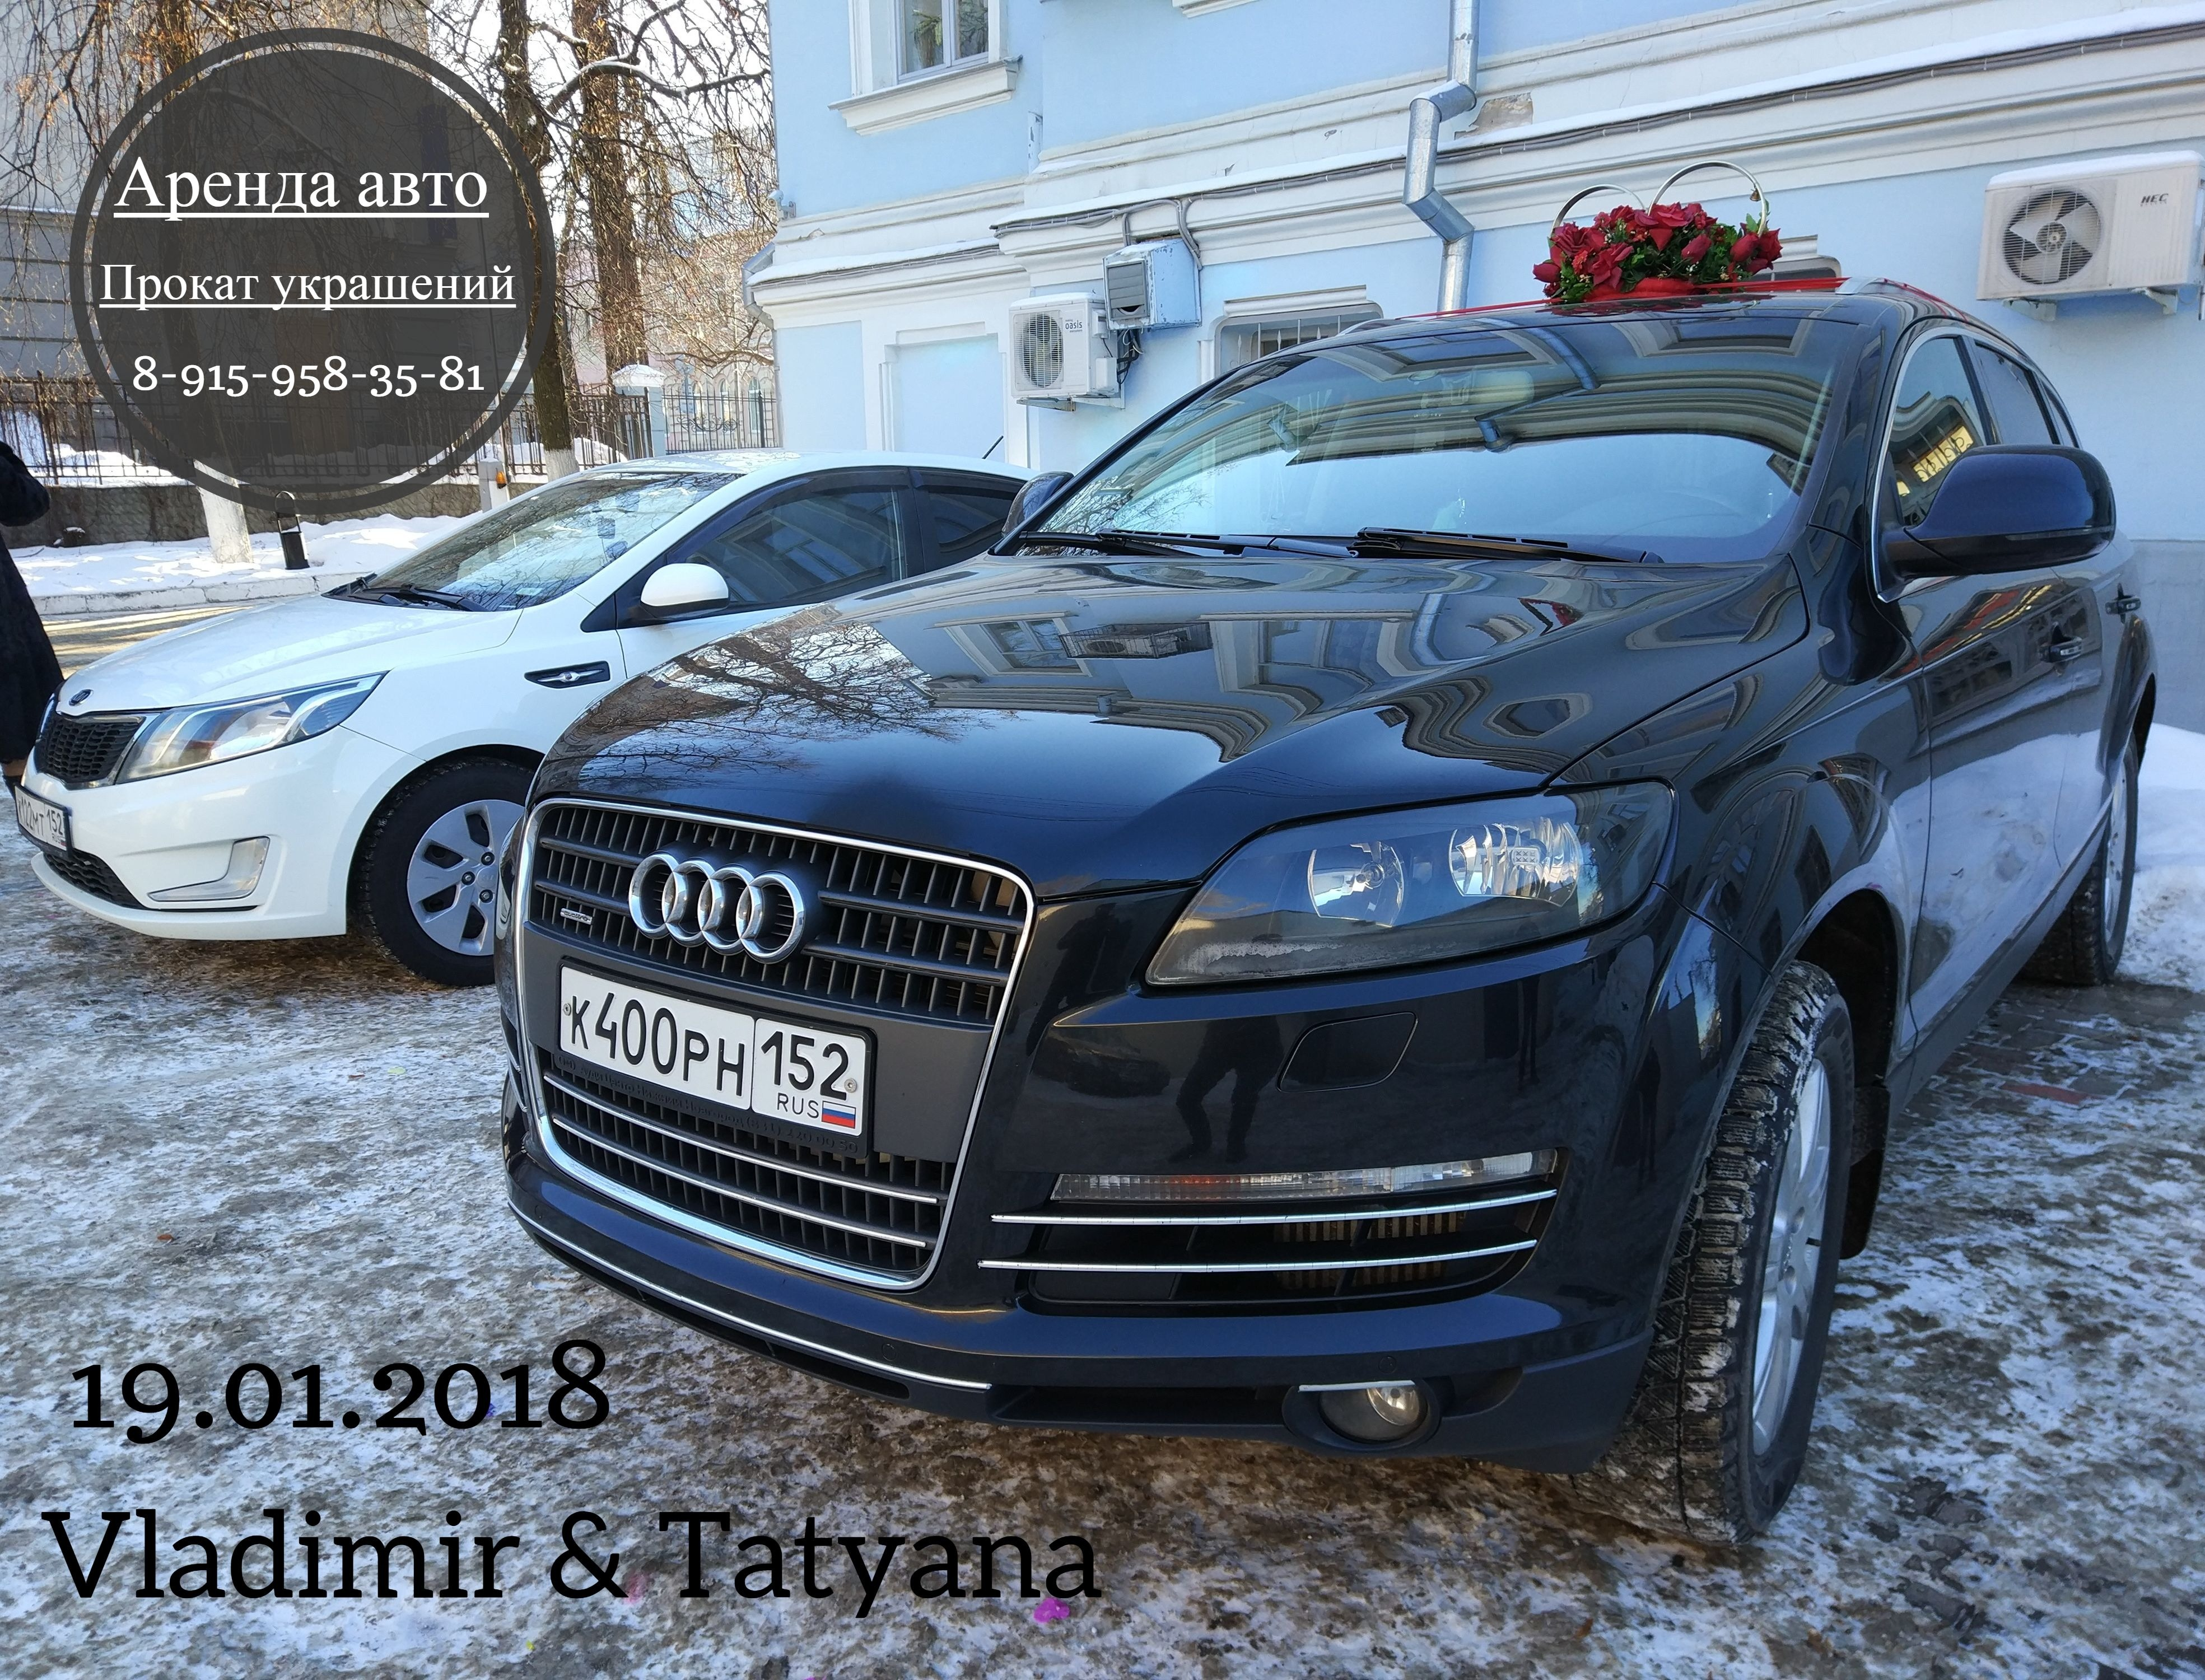 Audi Q7 в Нижнем Новгороде